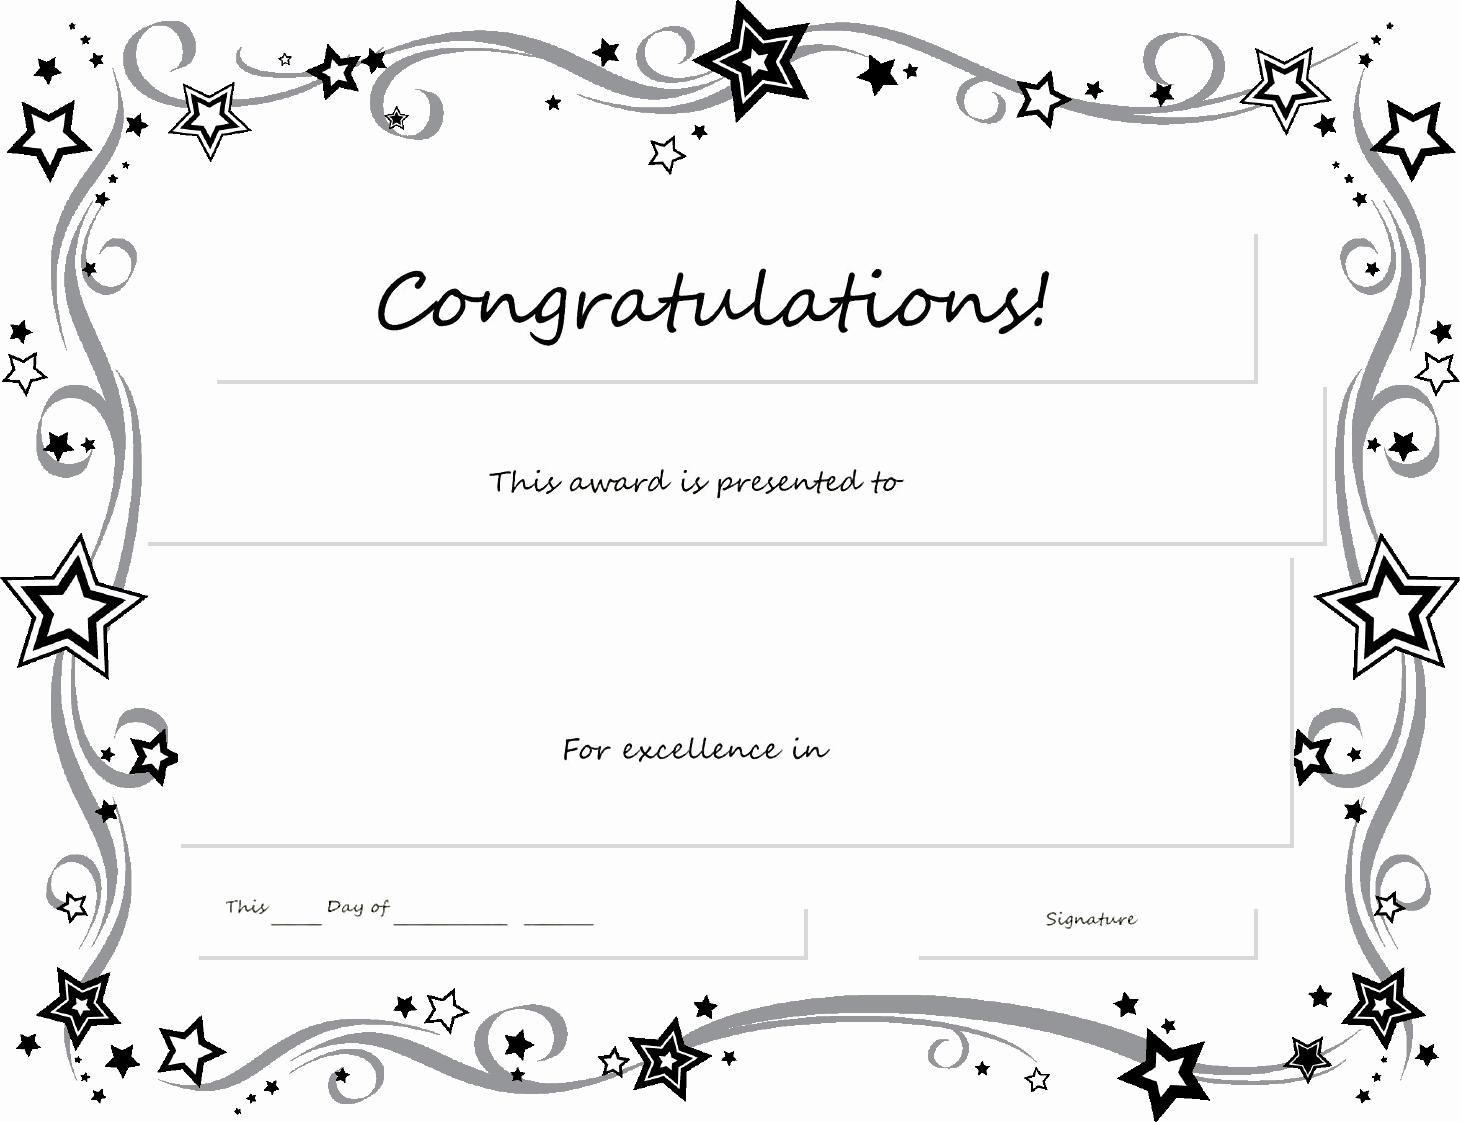 Free Downloadable Award Certificate Templates Fresh Certificate Template Word Certificate Templates Trakore